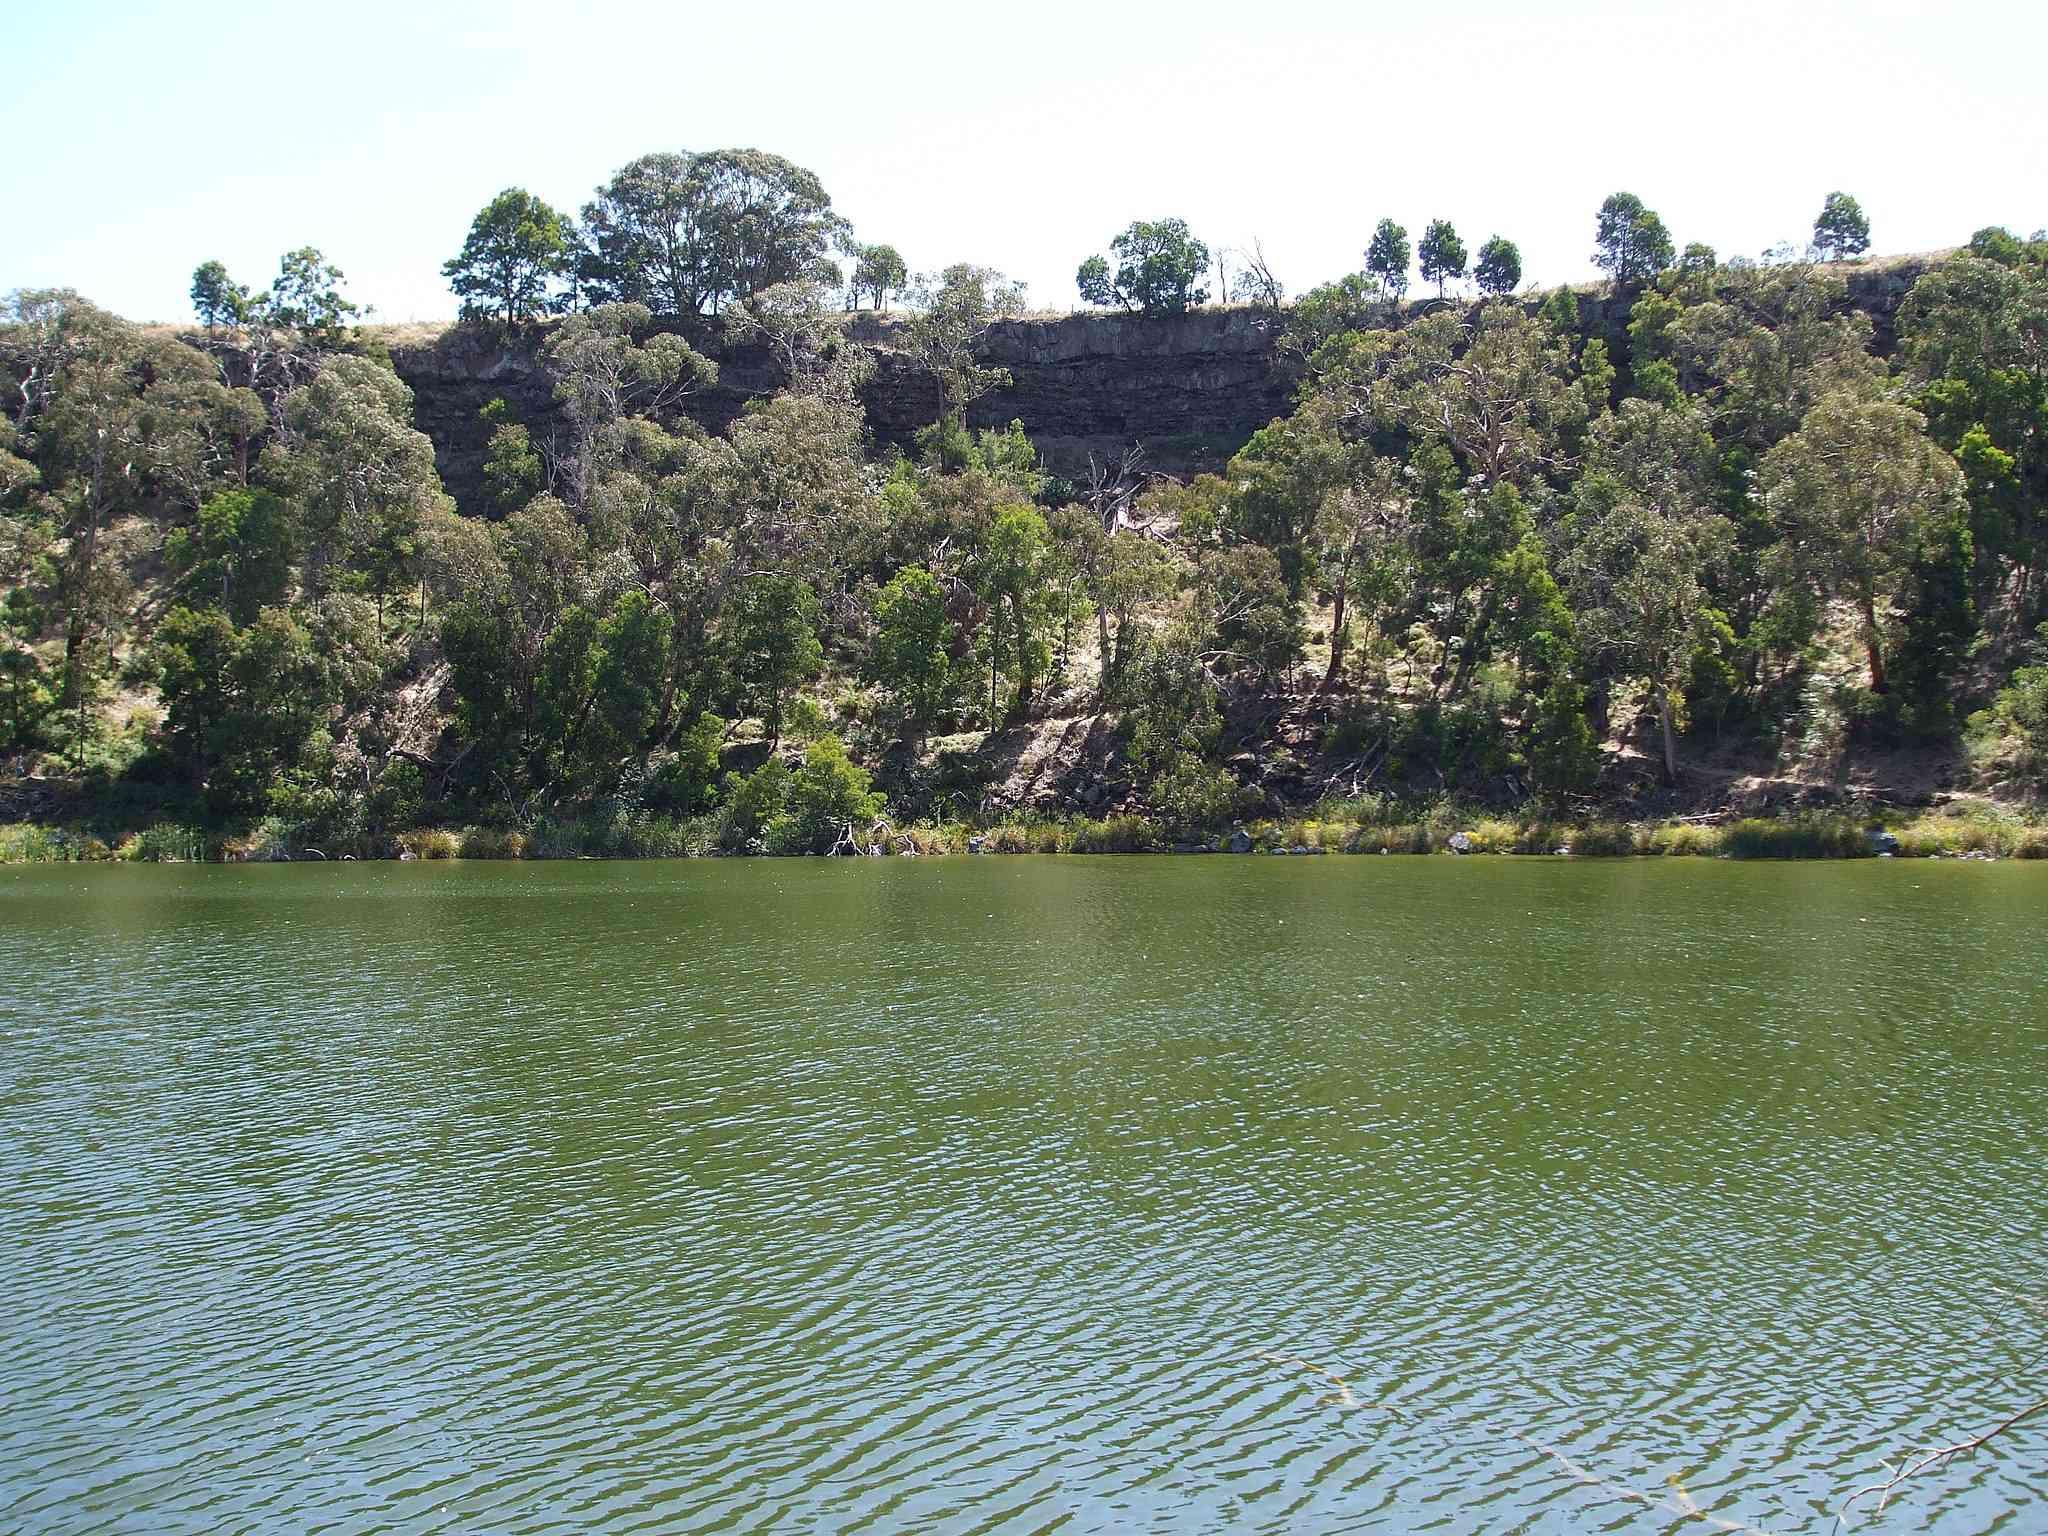 Lake Surprise, Budj Bim ‐ Mt Eccles National Park, Victoria, Australia